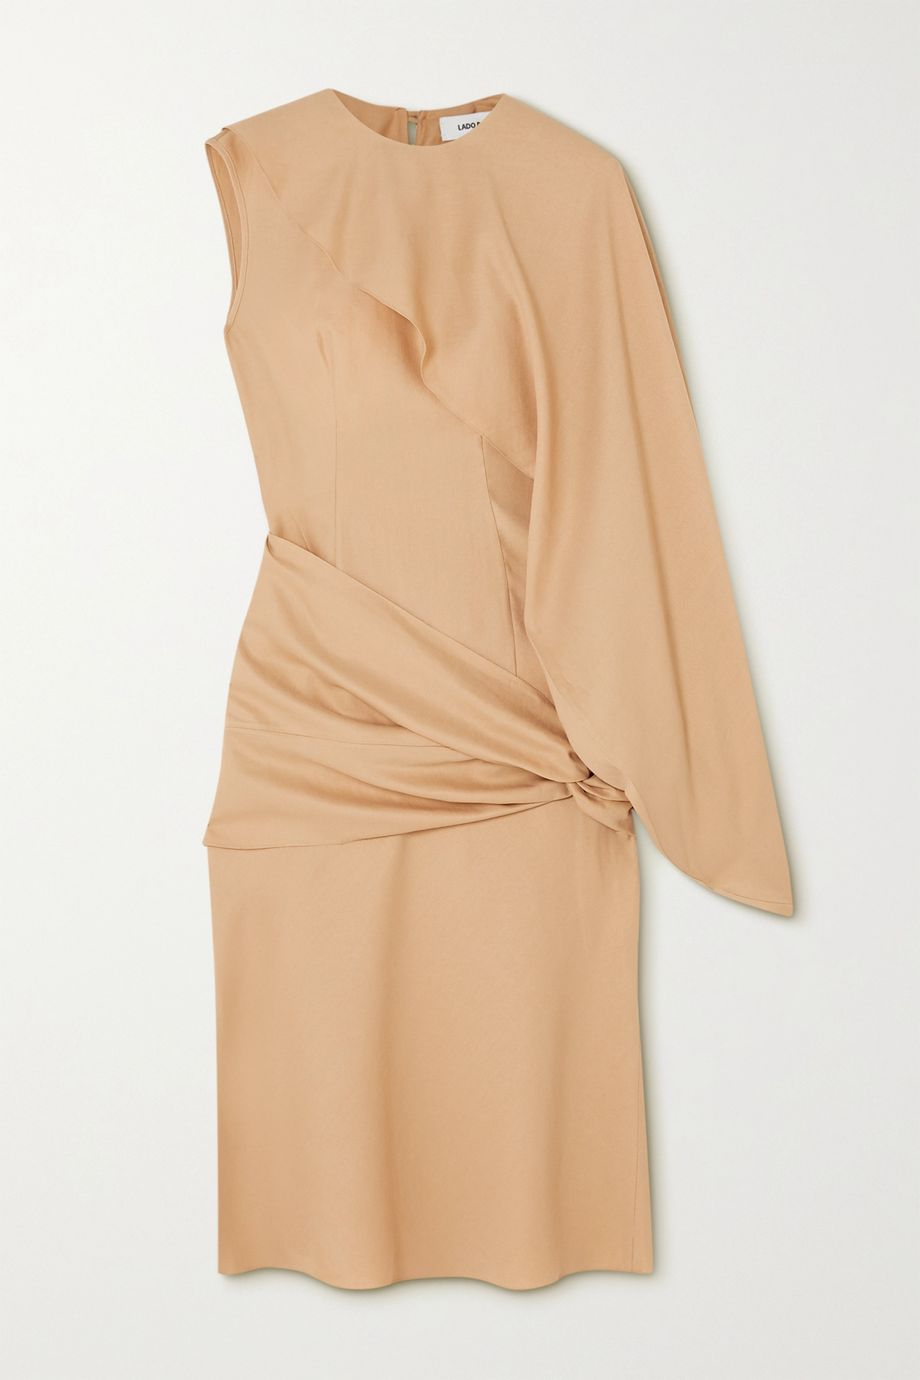 Lado Bokuchava One-sleeve belted draped twill midi dress